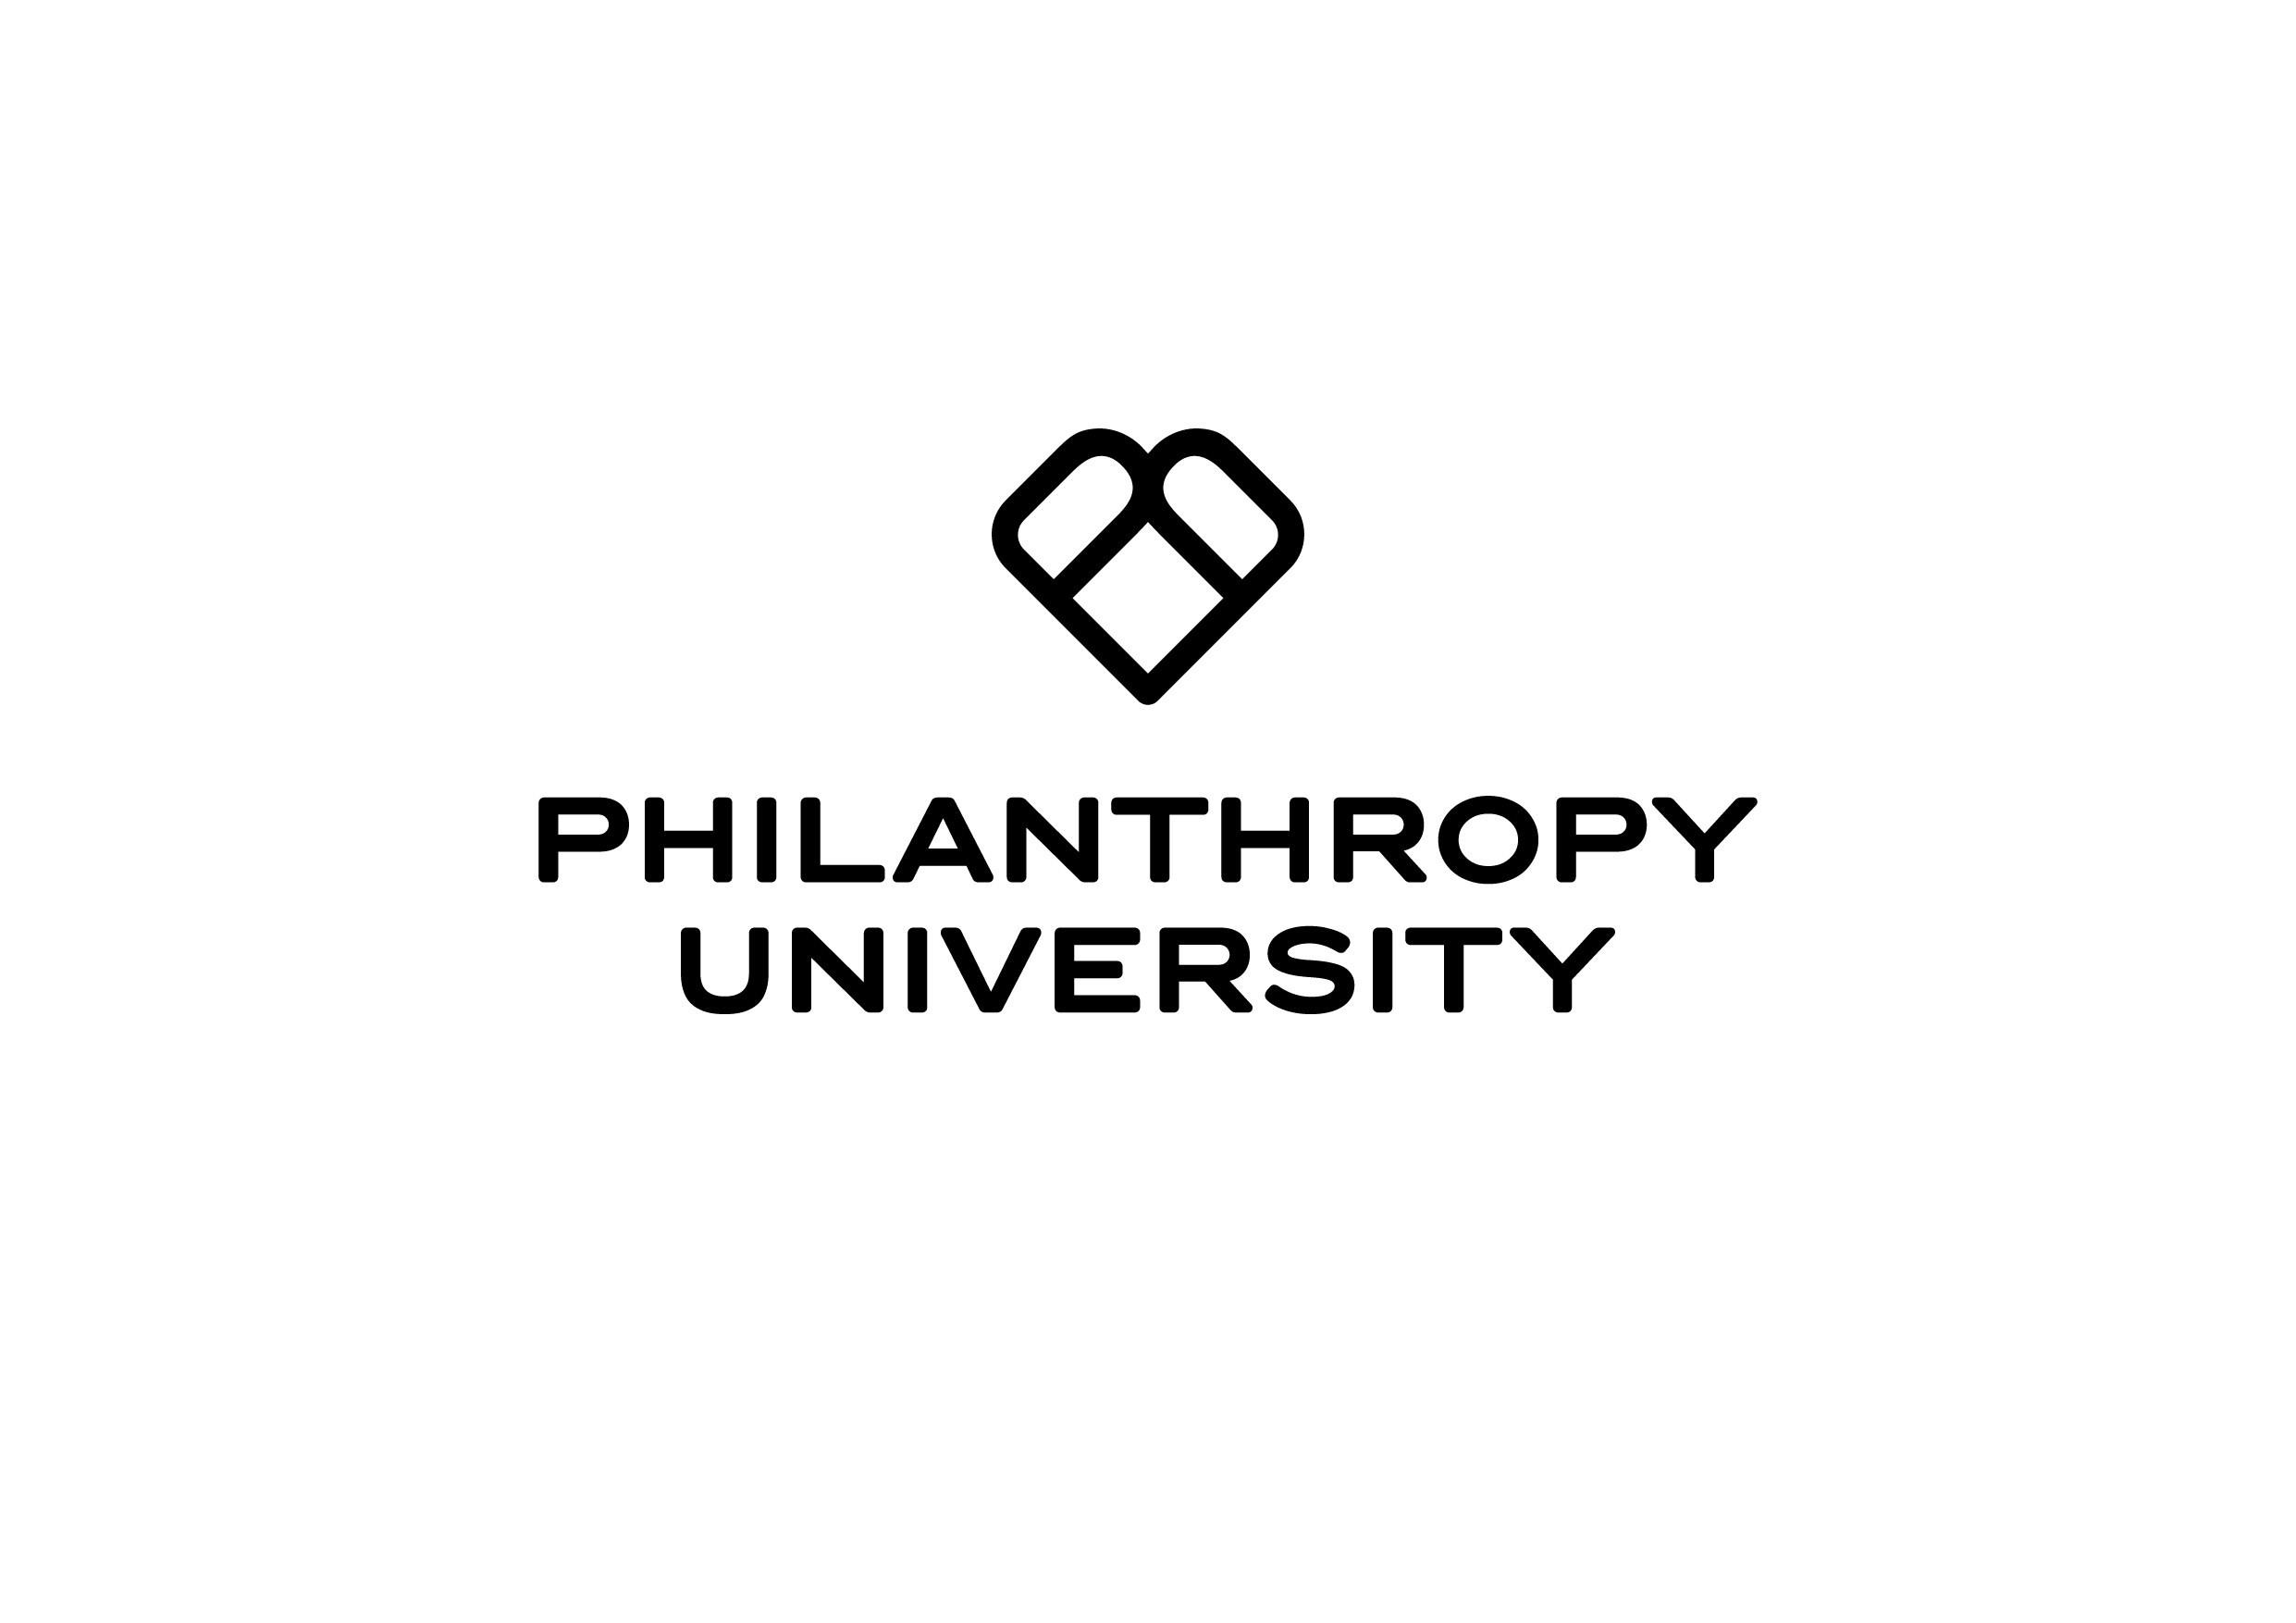 (PRNewsfoto/Philanthropy University)